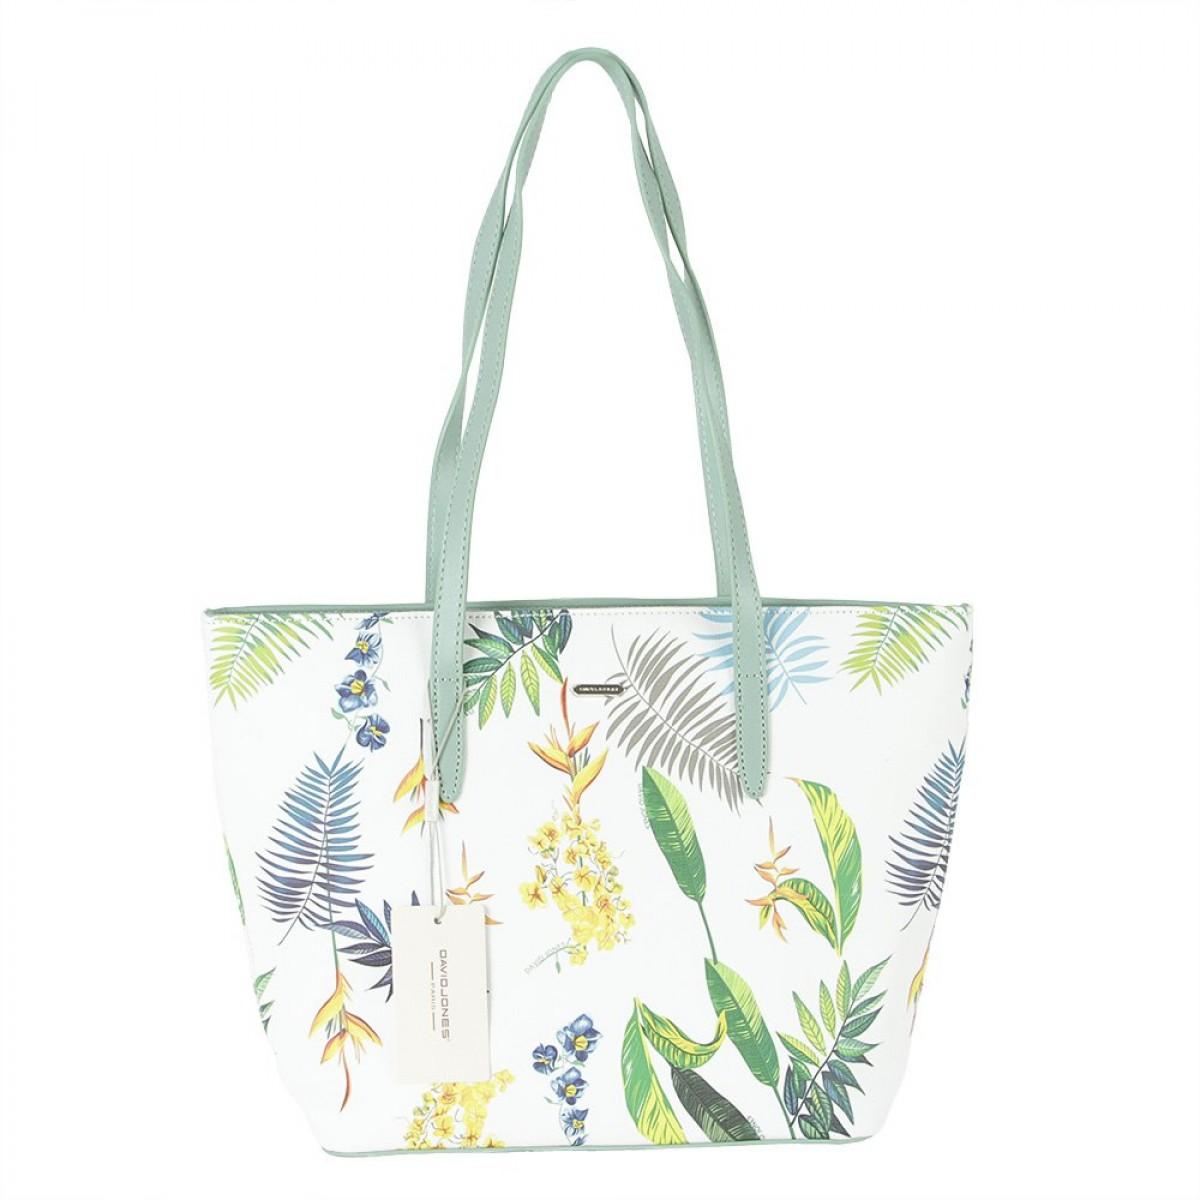 Жіноча сумка David Jones 6306-4 PALE GREEN